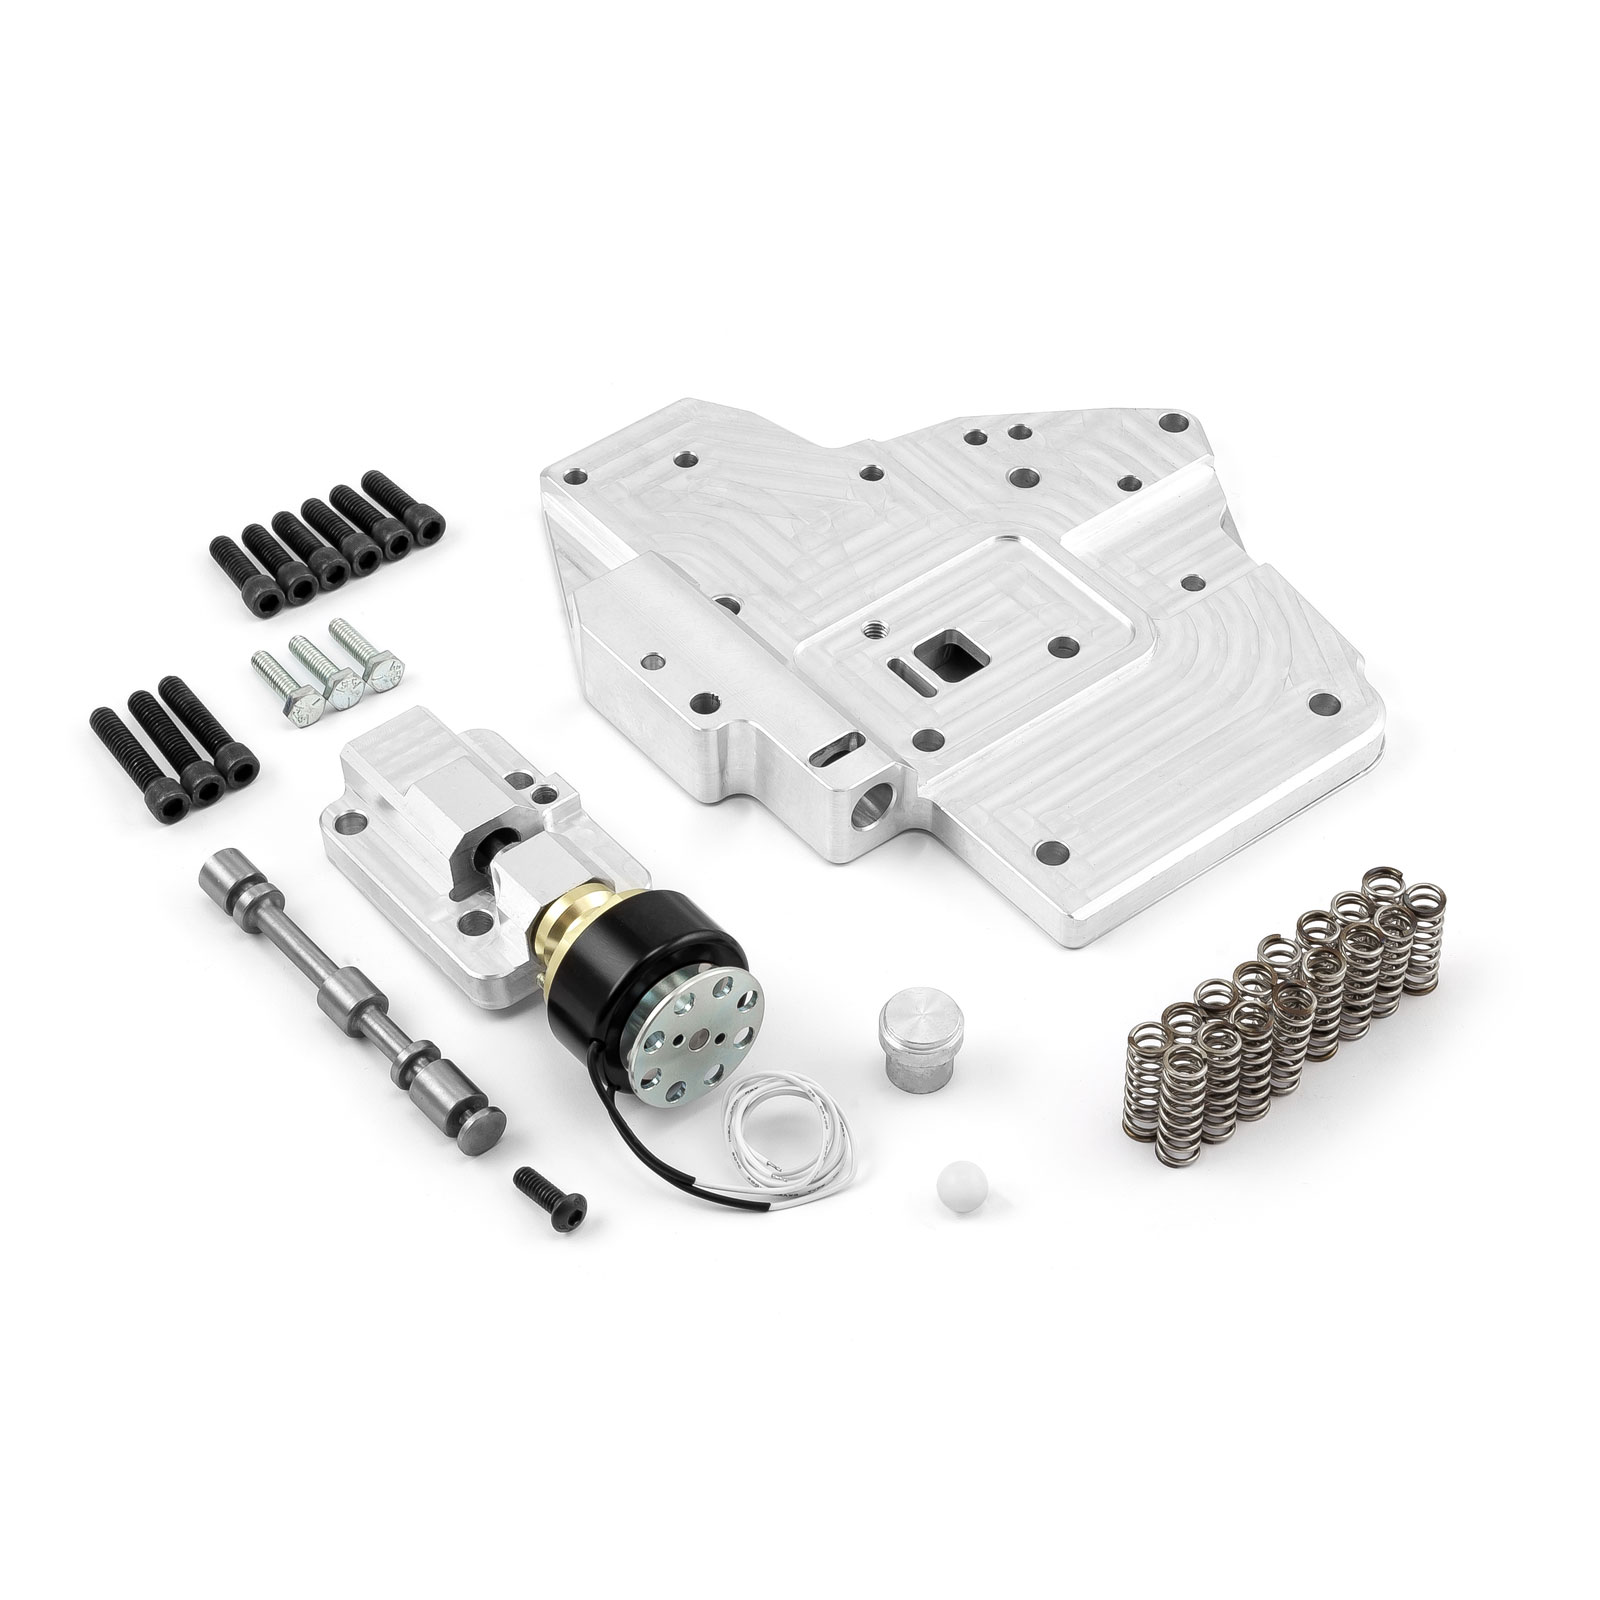 GM TH400 Transmission Billet Aluminum TransBrake Full Manual Valve Body